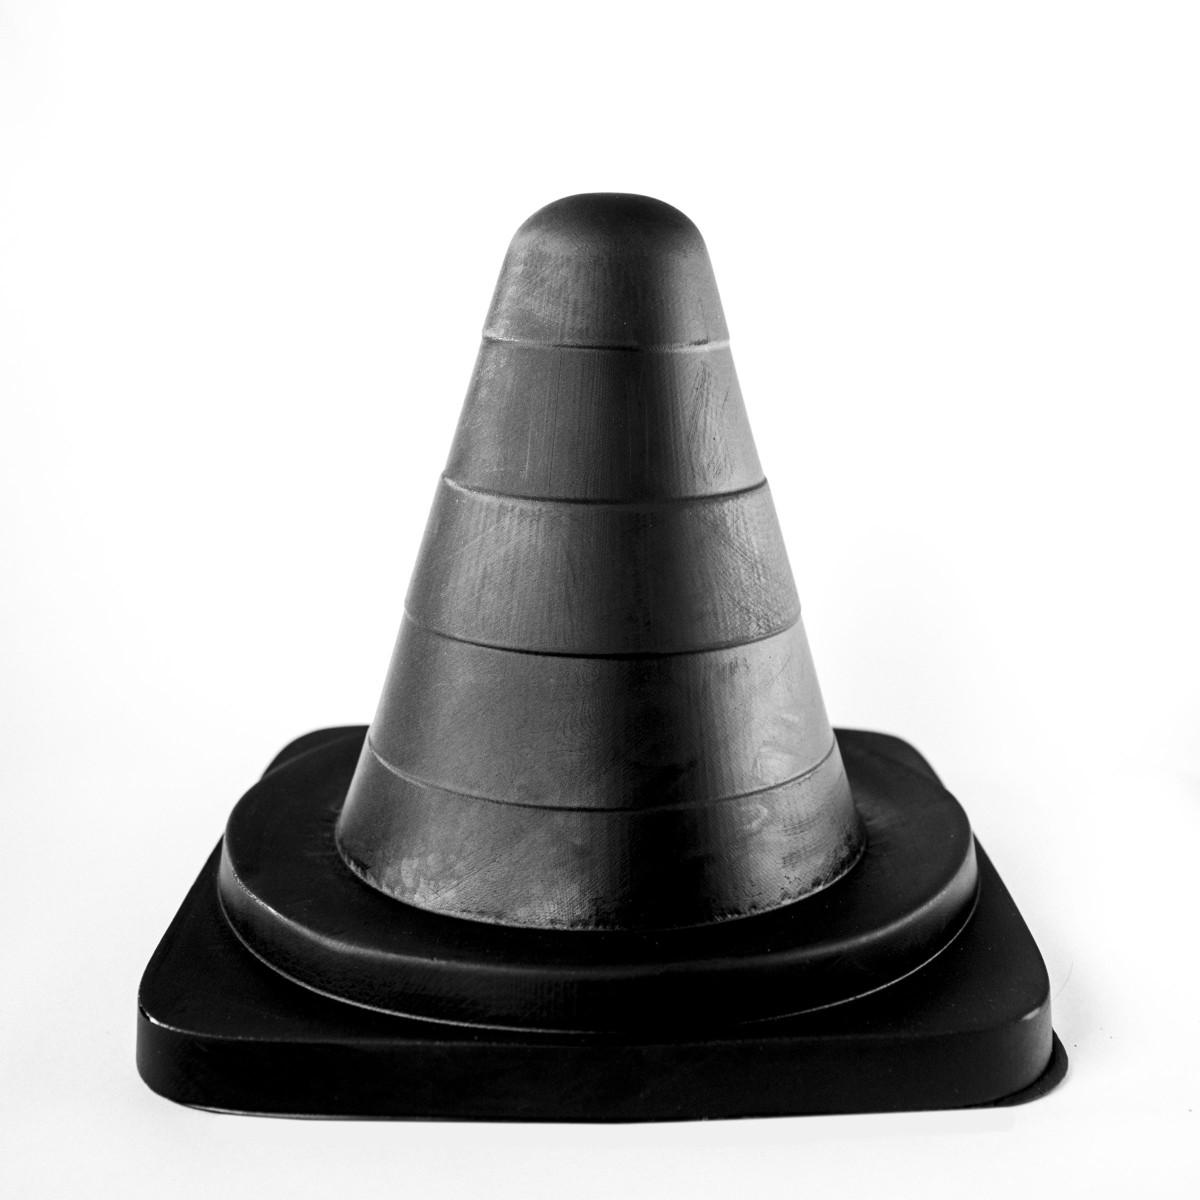 All Black AB68 Butt Plug